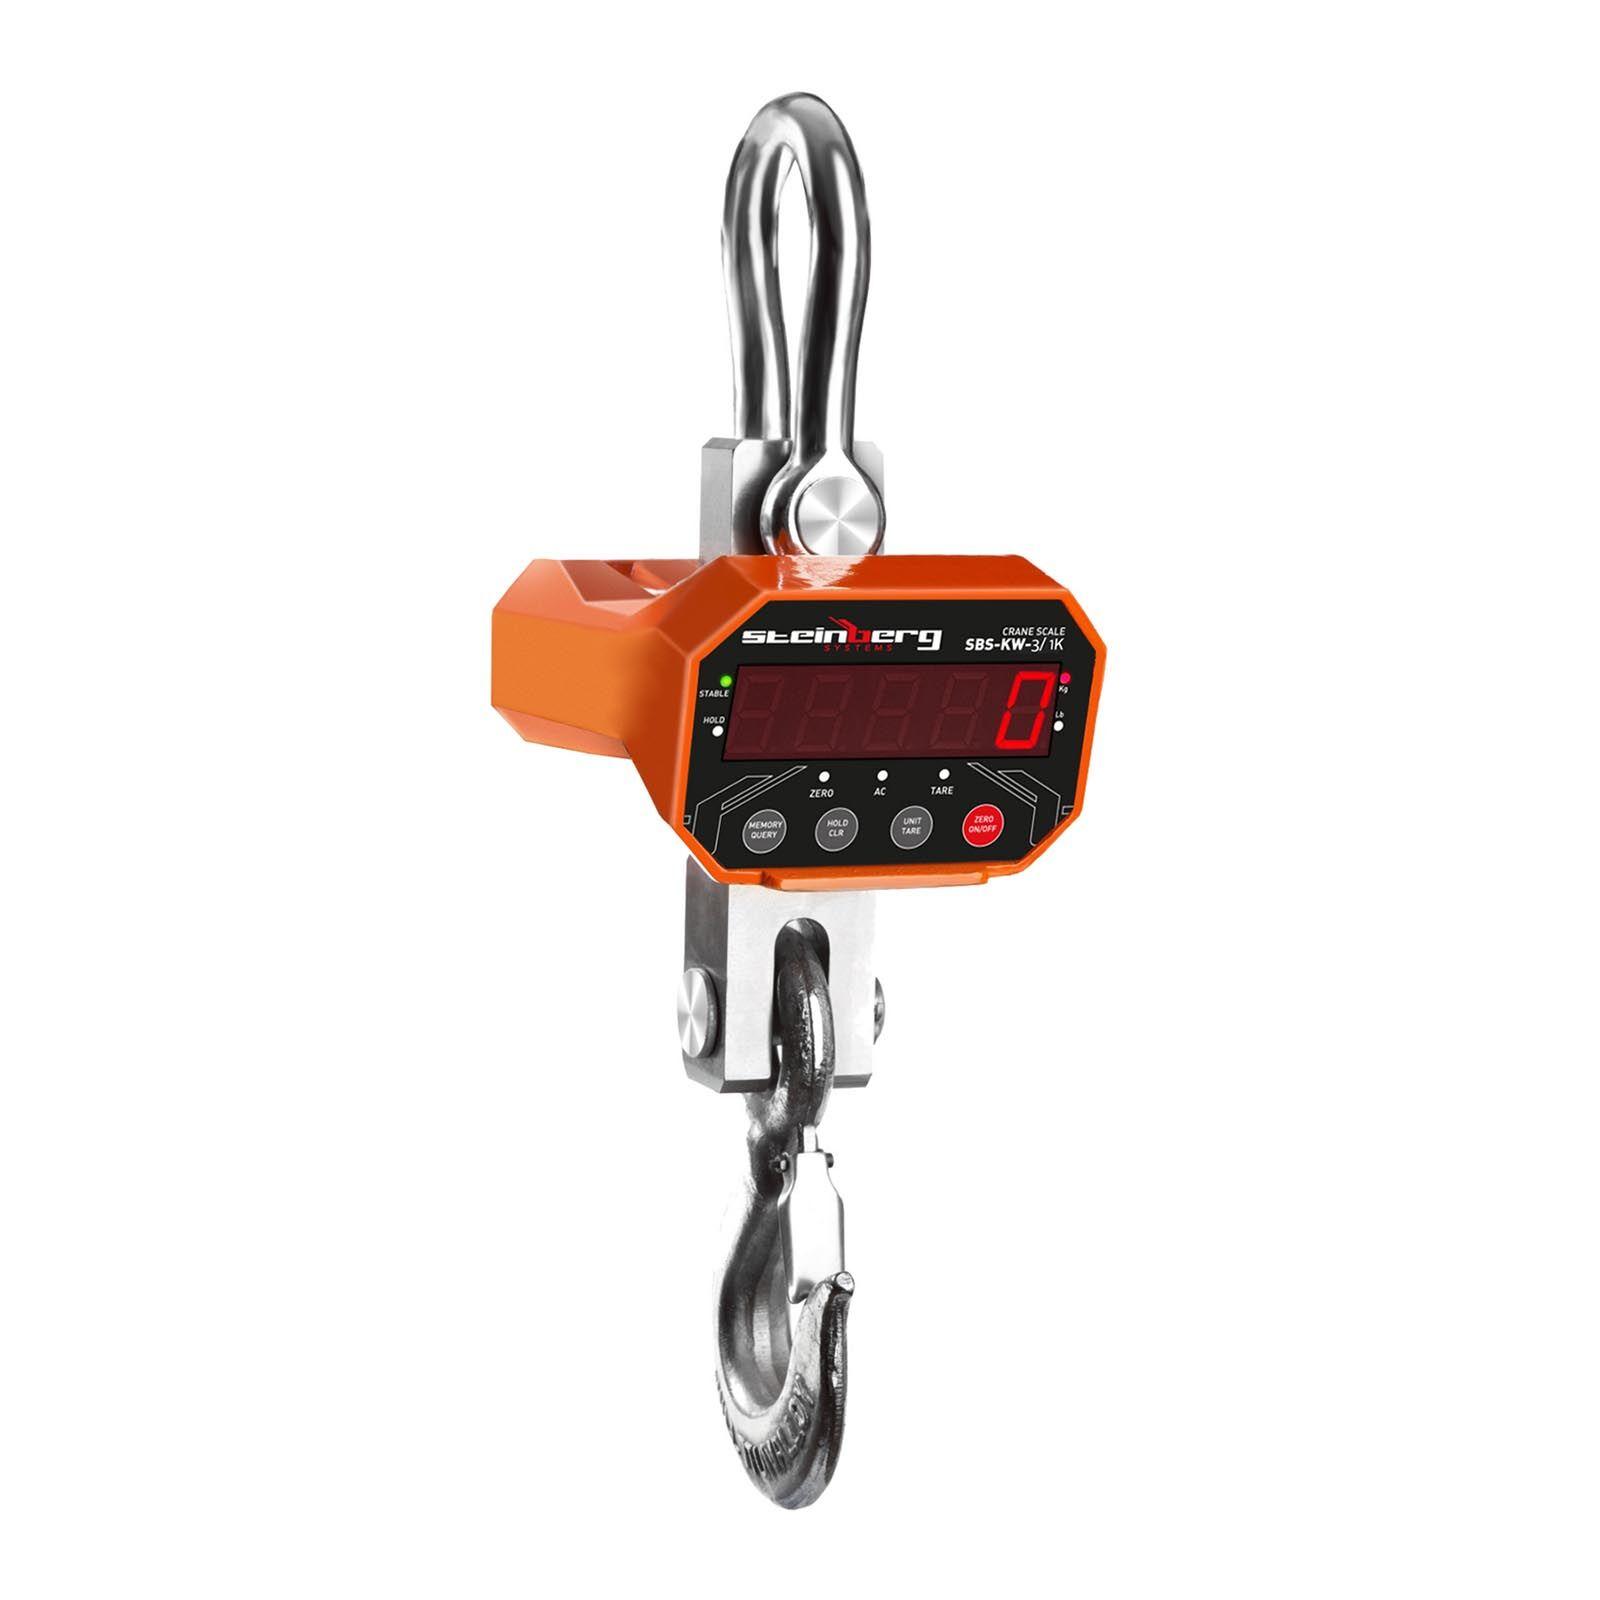 Steinberg Crane Scales - 3 t / 1 kg - LED